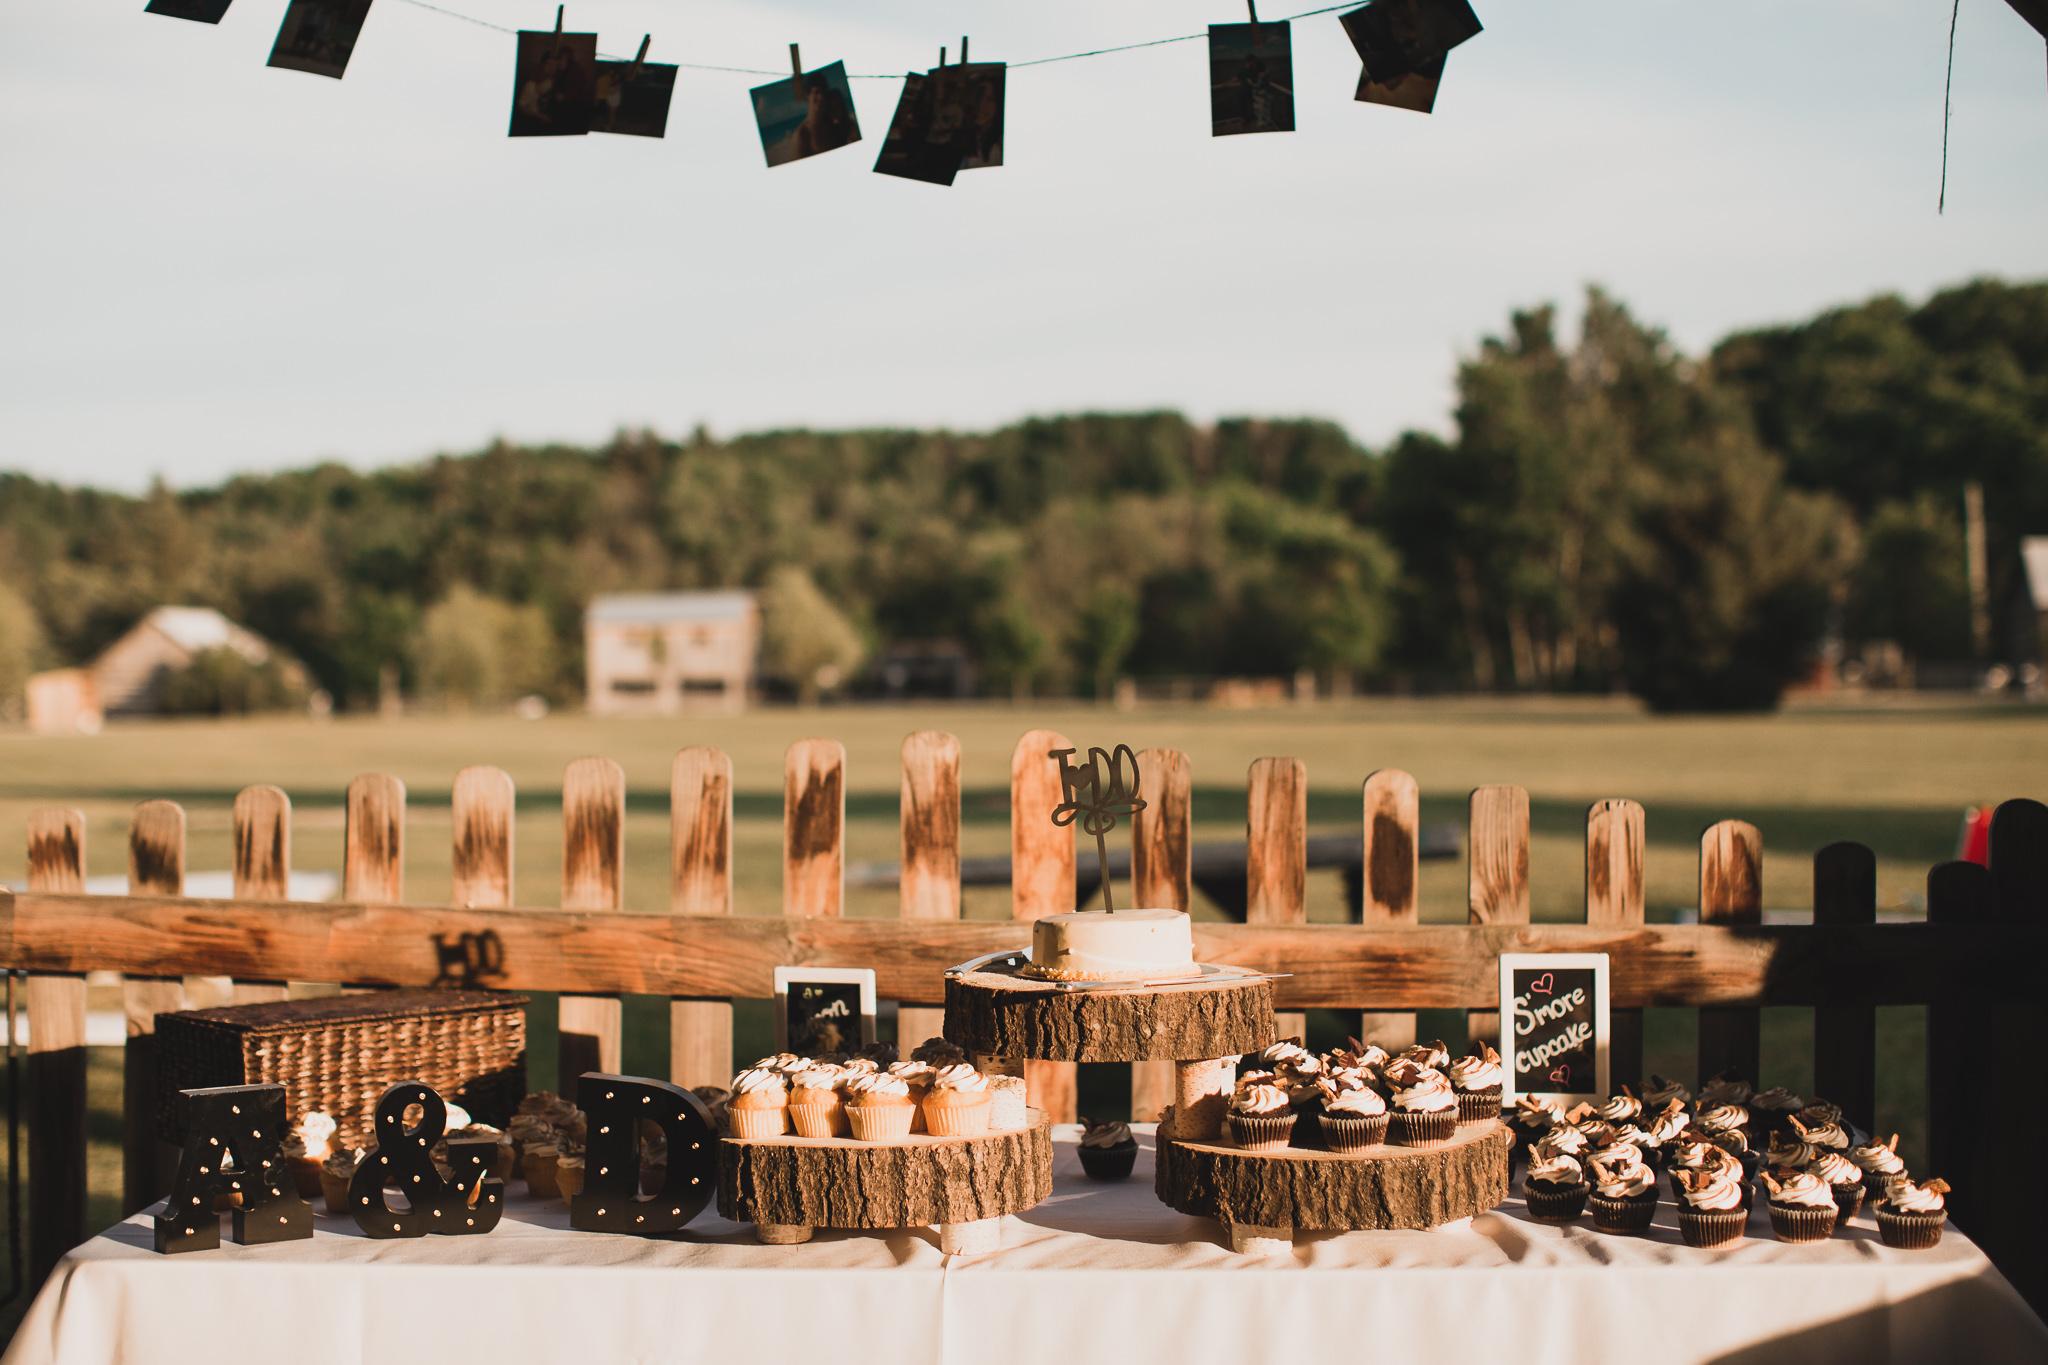 Rustic cupcake table wedding